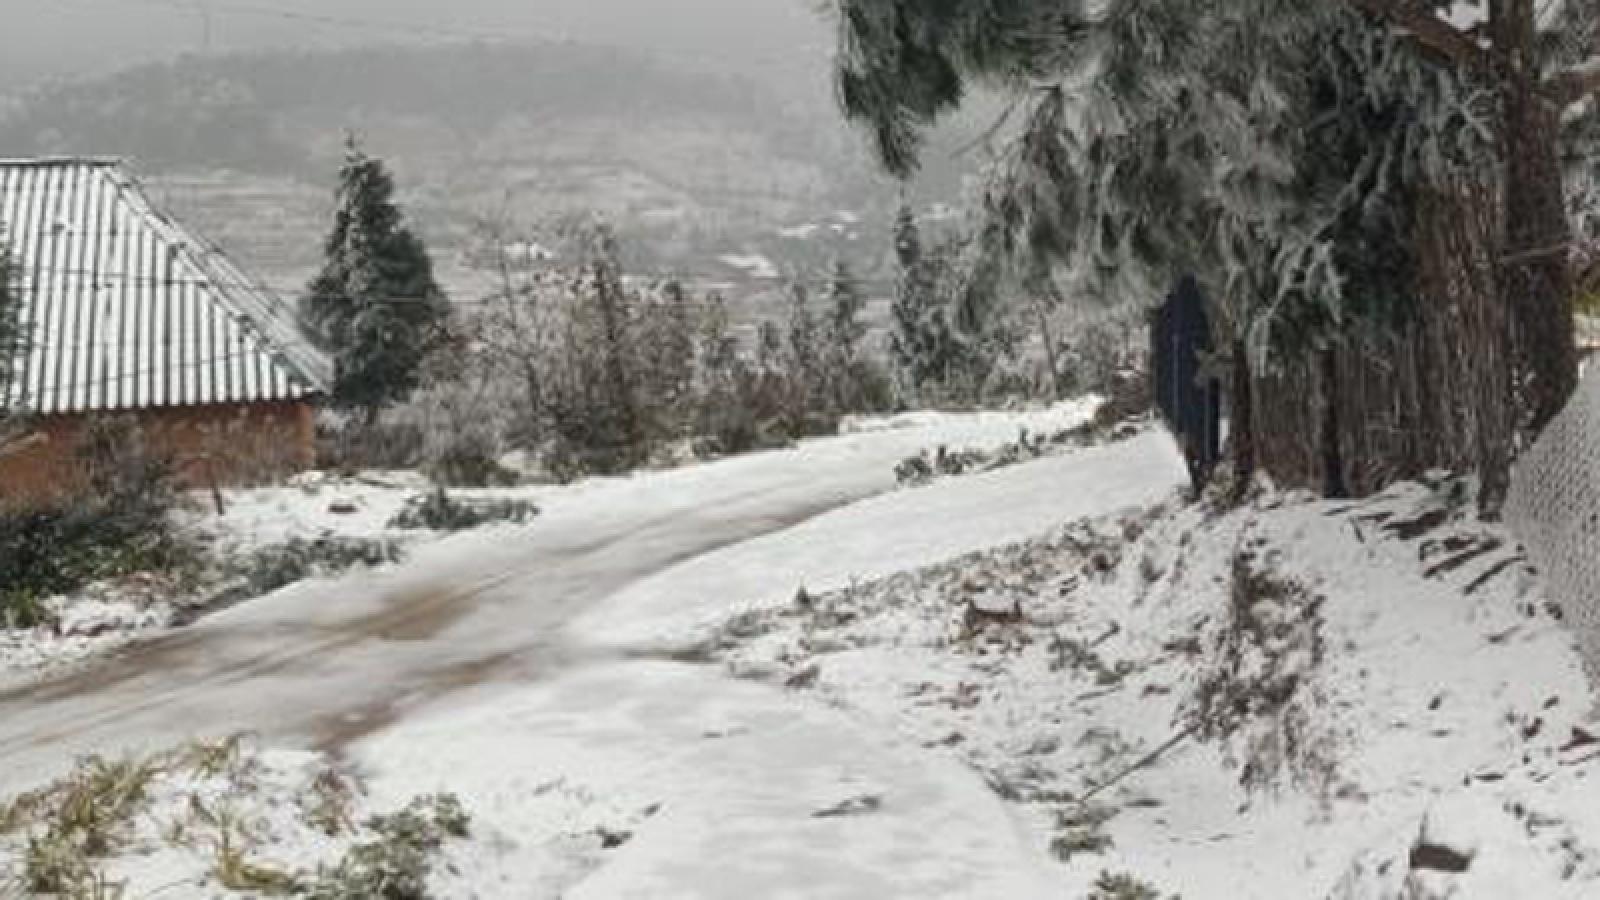 White snow transforms Y Ty commune into European-style village